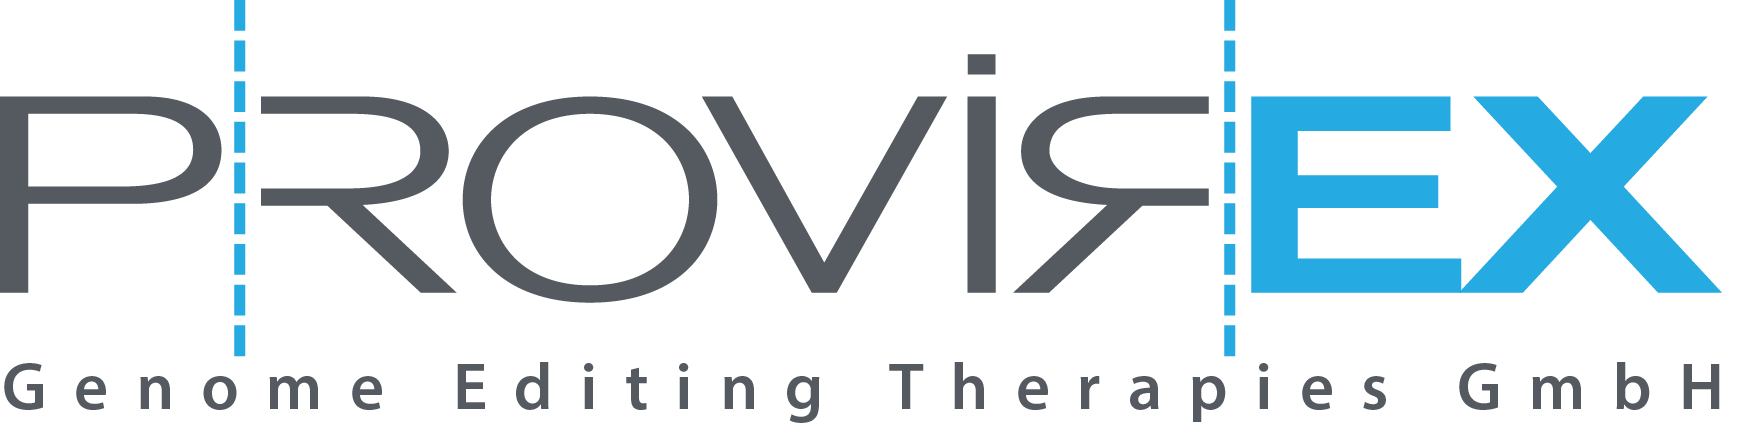 PROVIREX Genome Editing Therapies GmbH